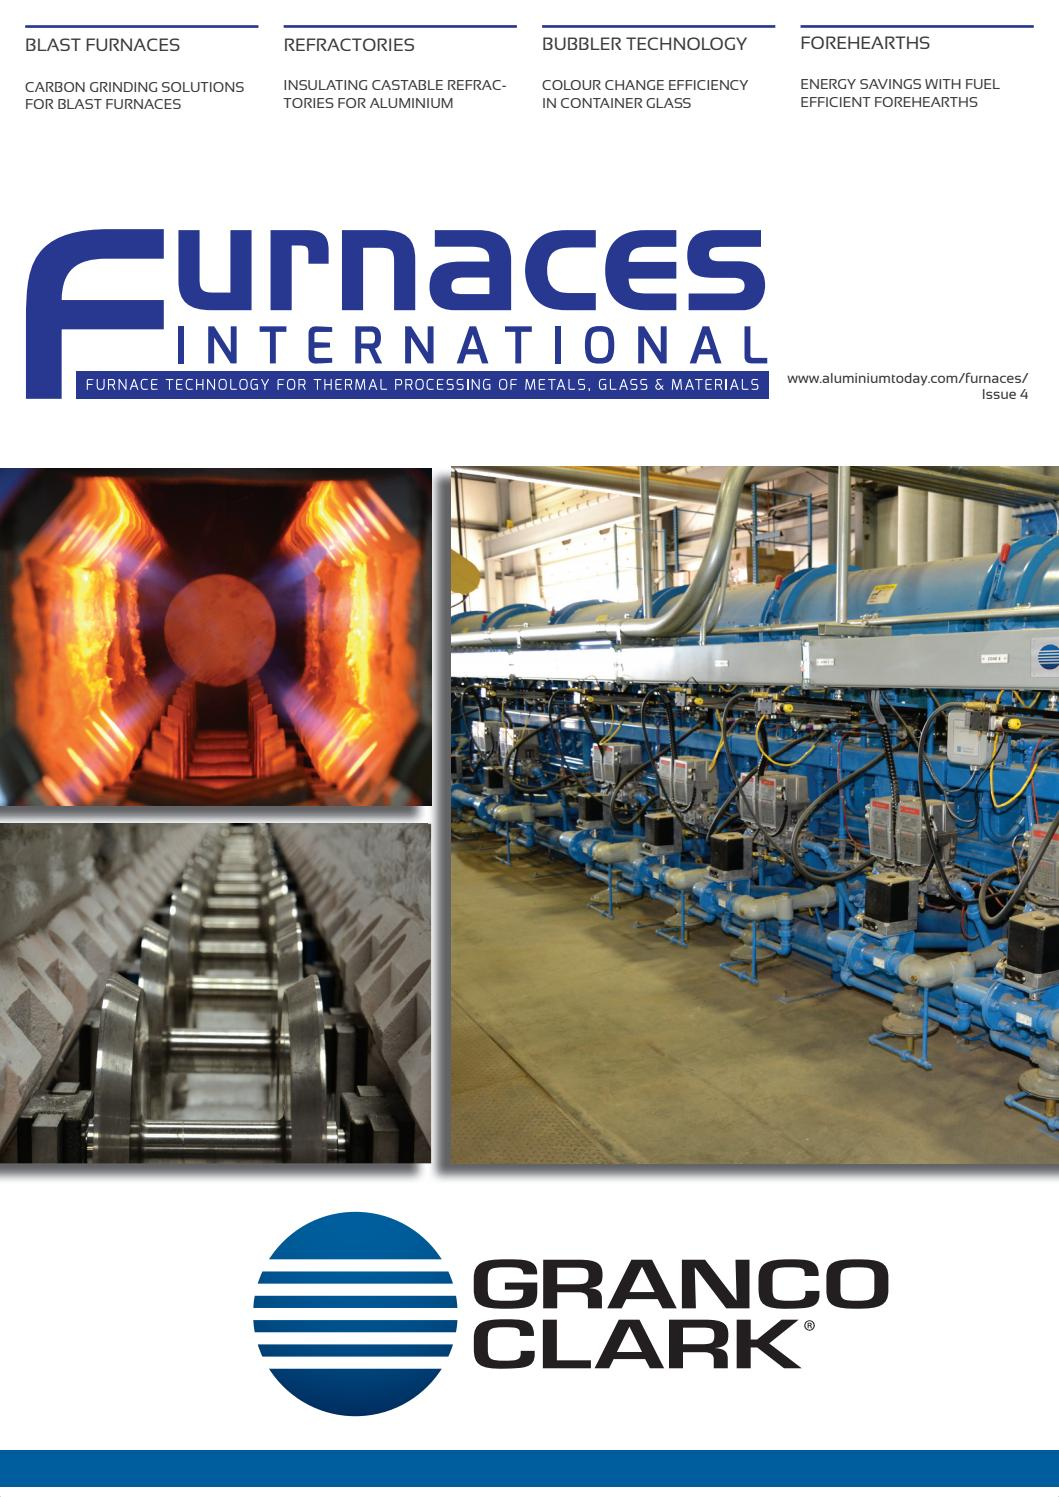 hight resolution of granco clark wiring diagram wiring diagrams schema furnaces international issue 4 by quartz issuu yamaha wiring